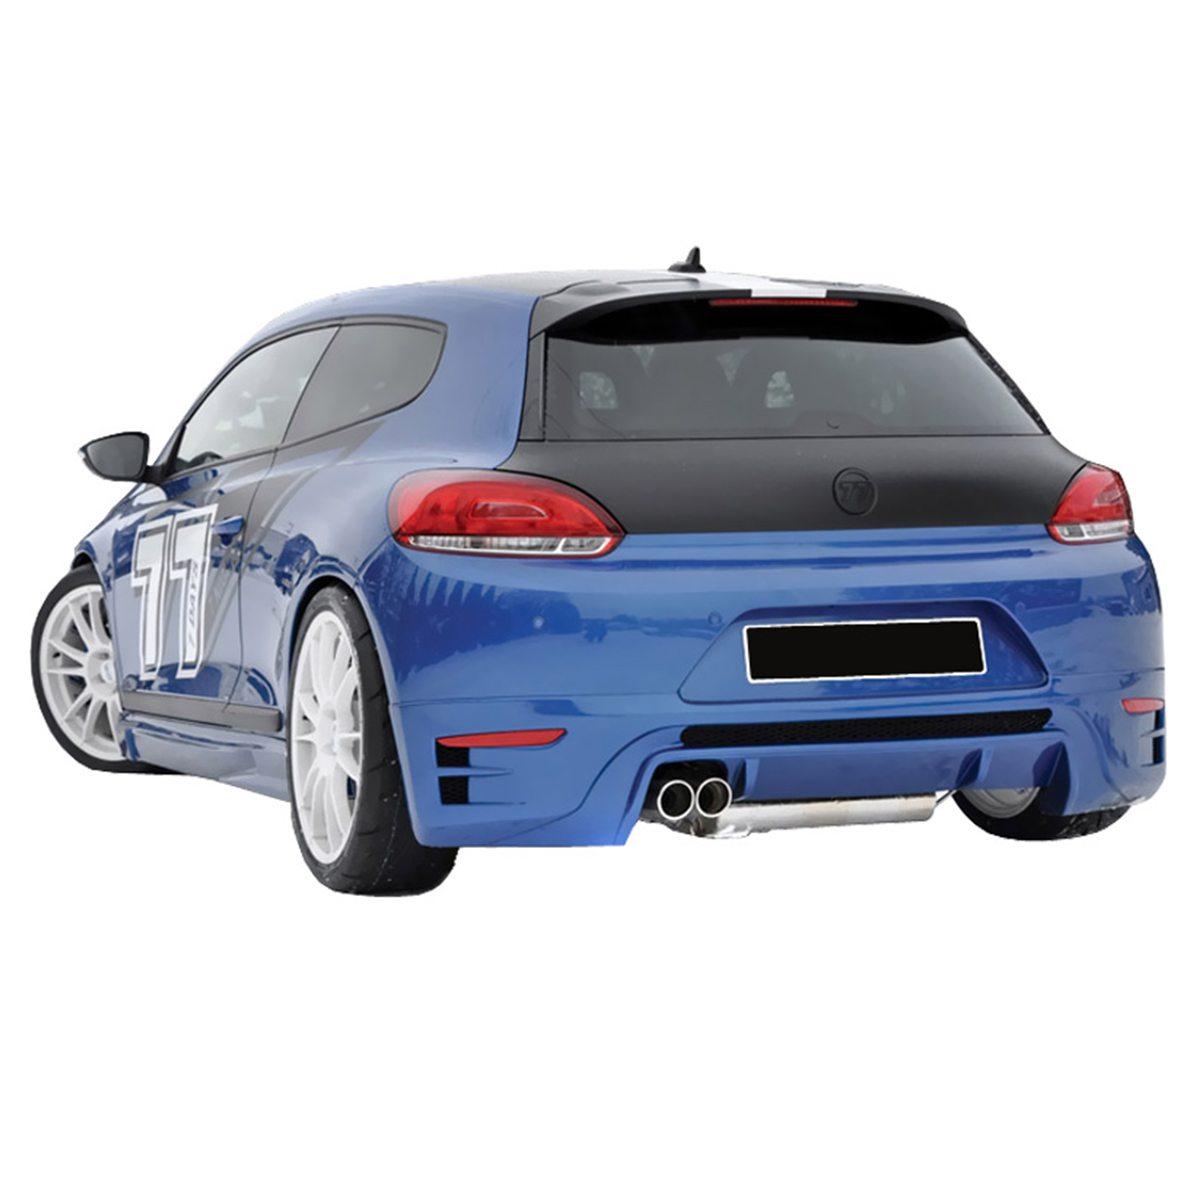 VW-Scirocco-Tras-PCS245